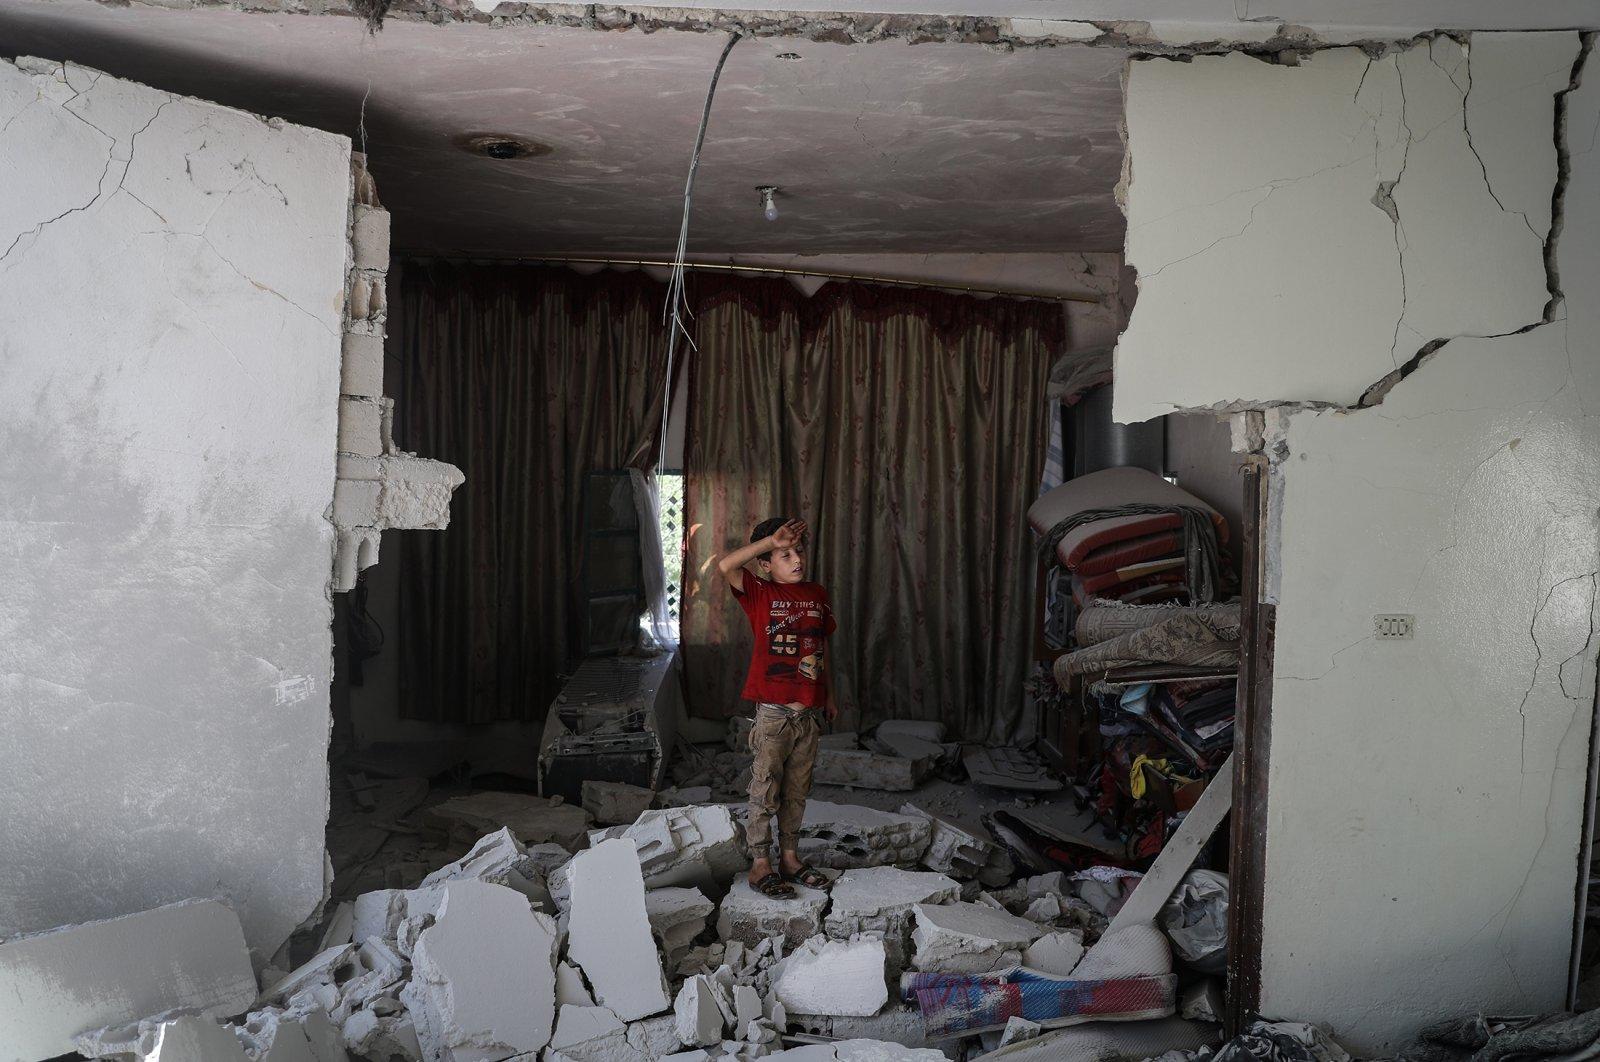 Rights Group Calls UN to Condemn Perpetrators of Attacks in Syria